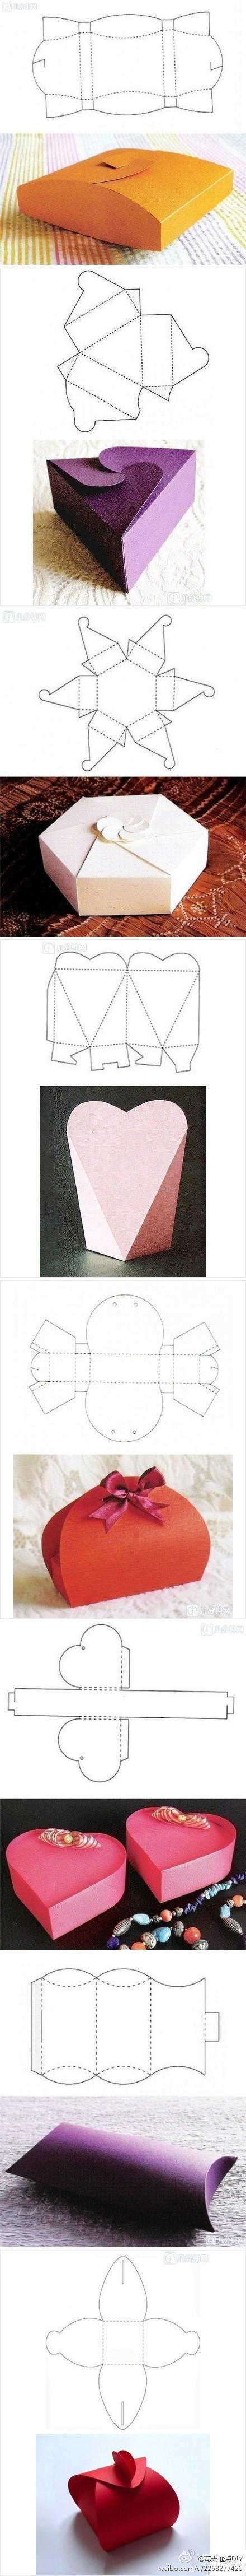 Moldes de cajitas para imprimir